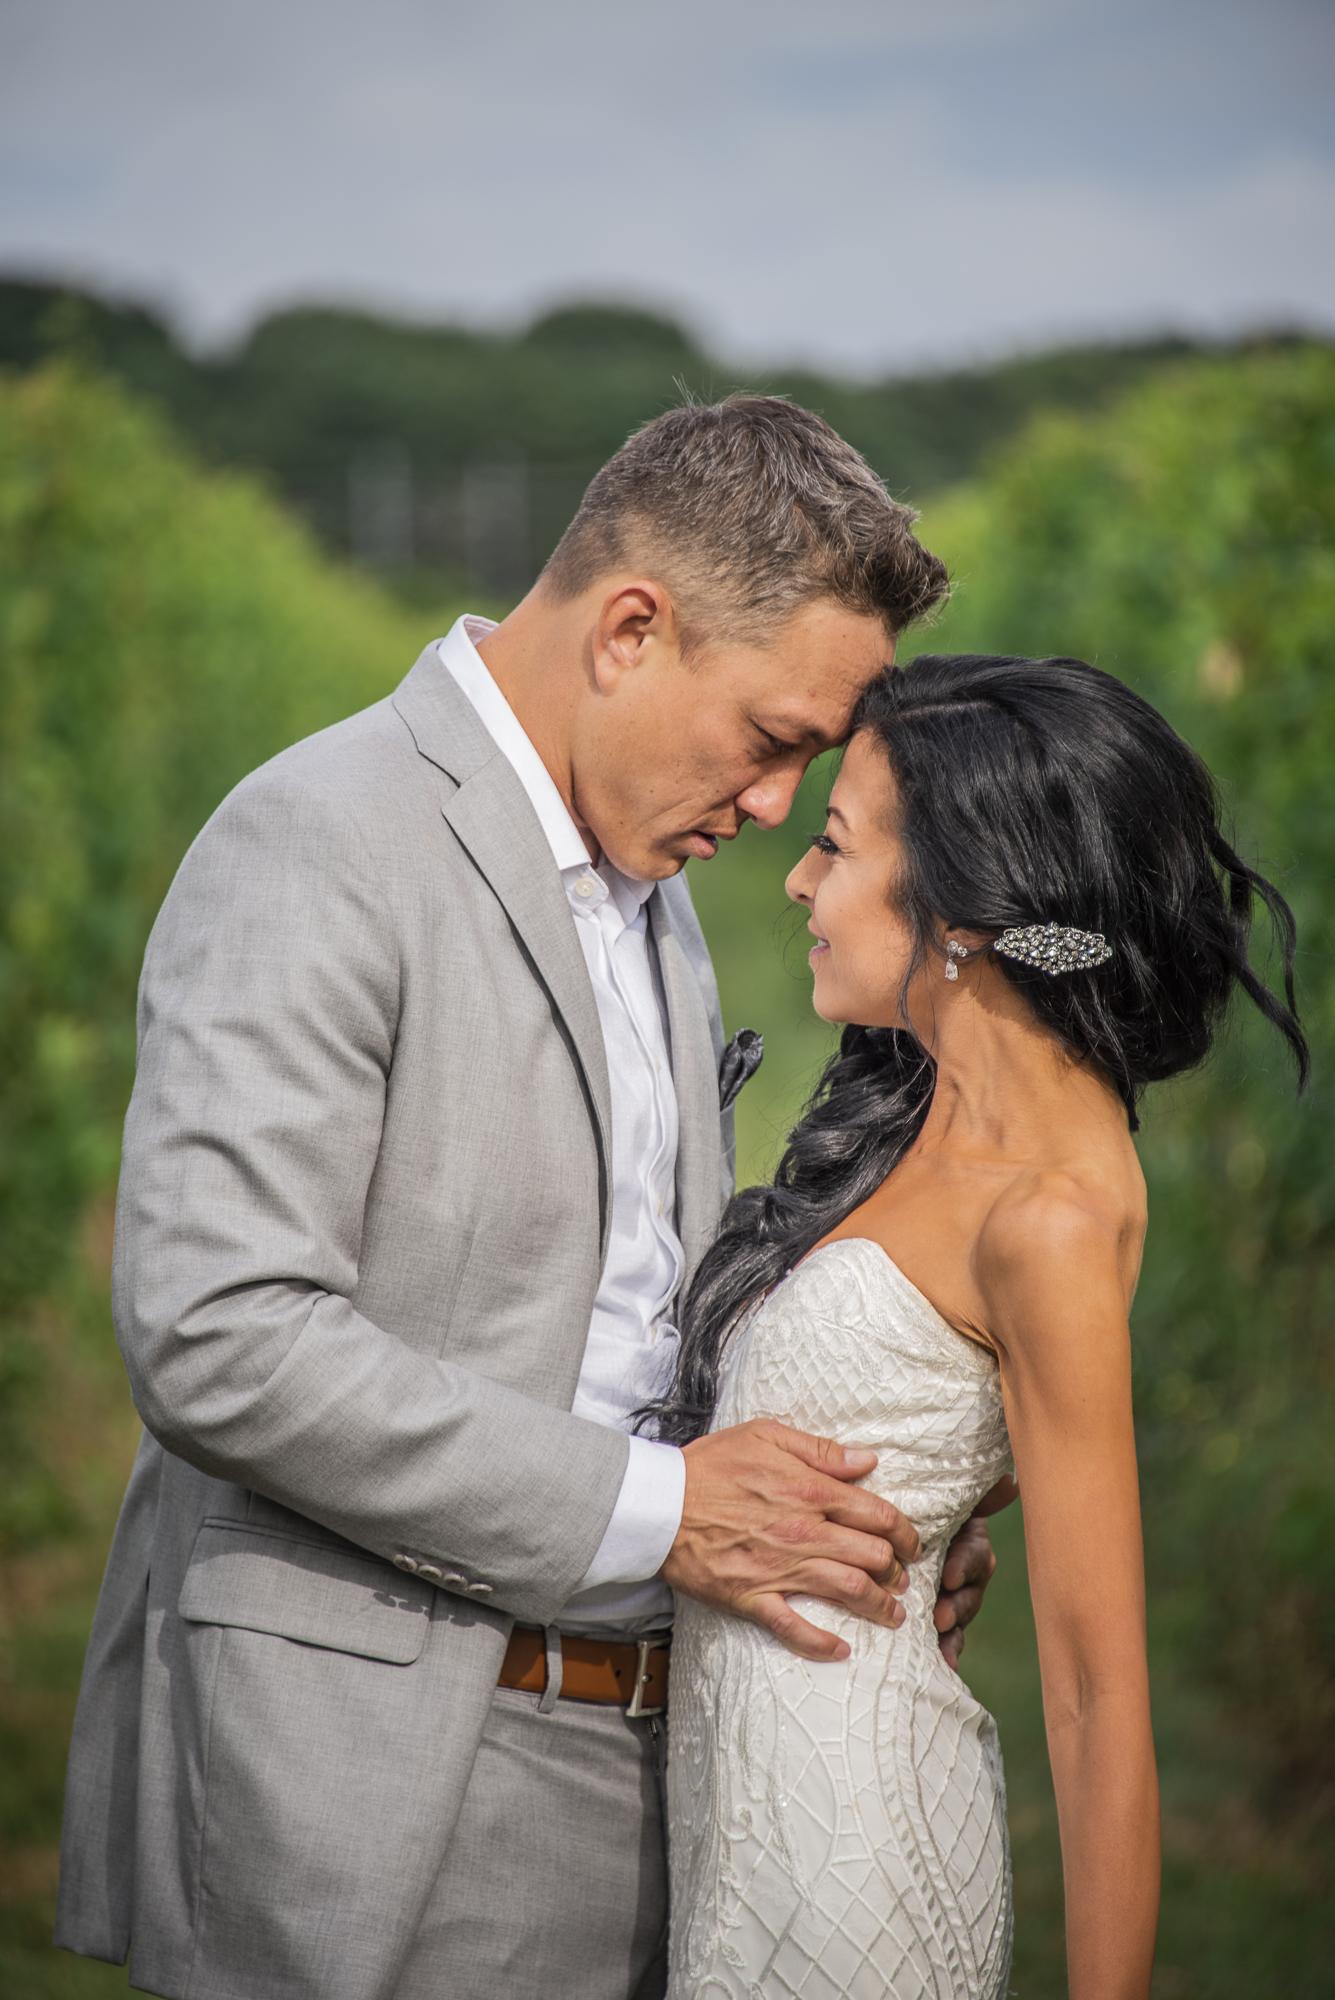 Ashley and Patrick Flynn-20180721-3257-RT-2000.jpg